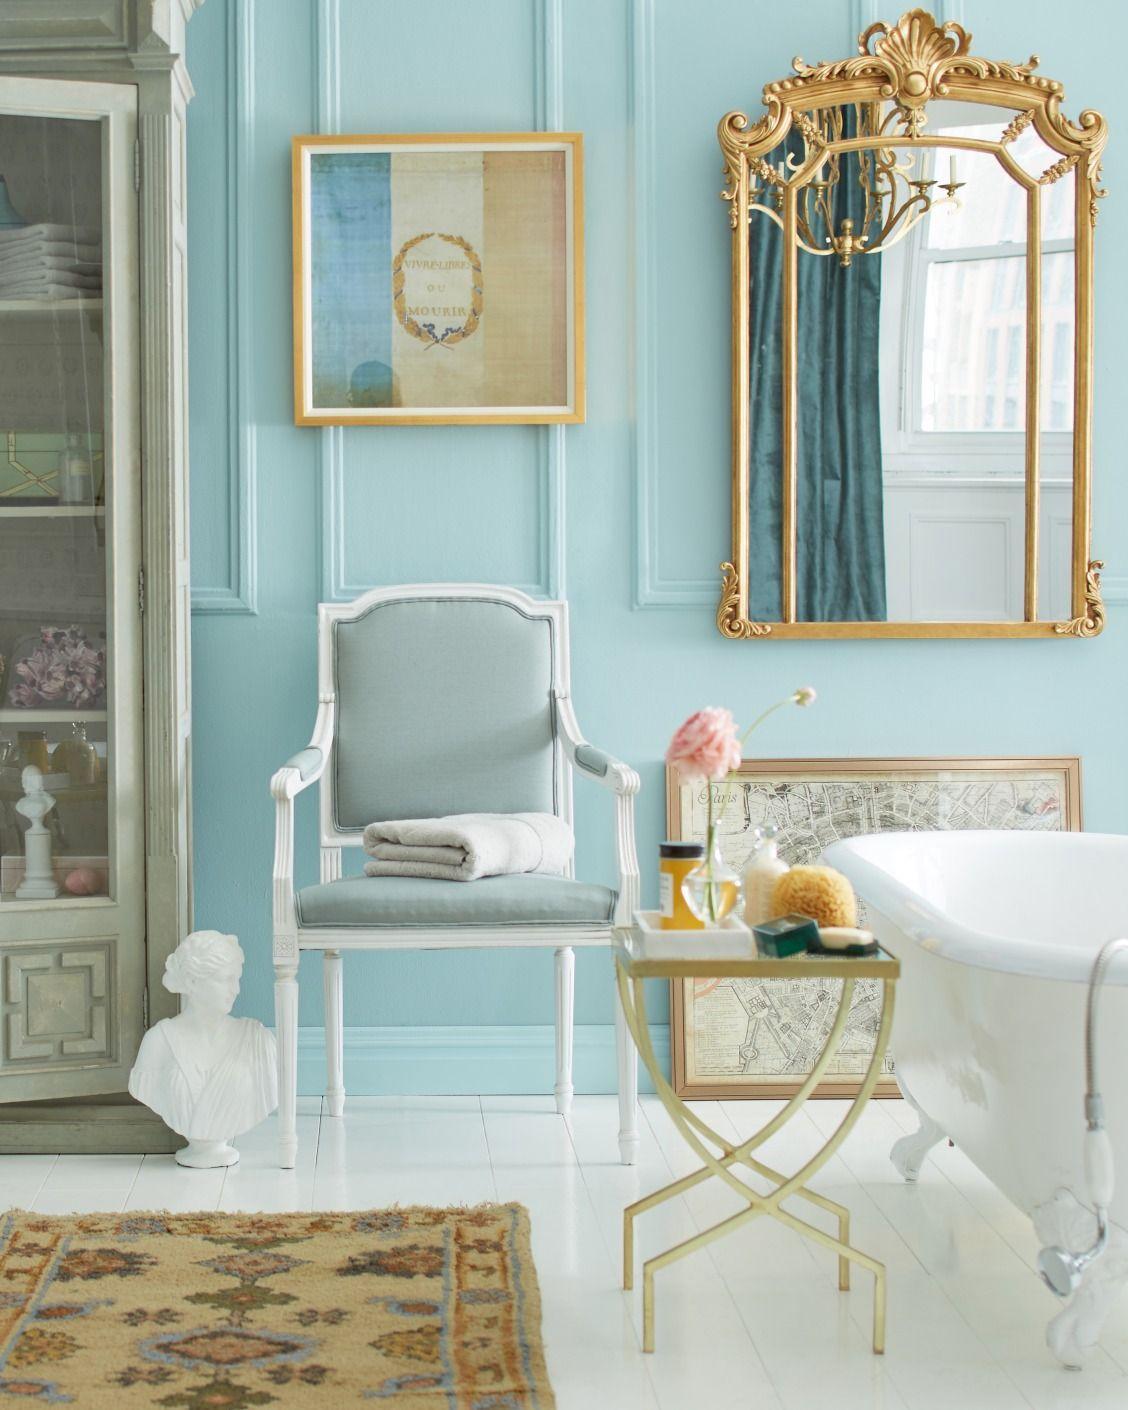 Stunning parisianinspired bathroom with light blue walls bright